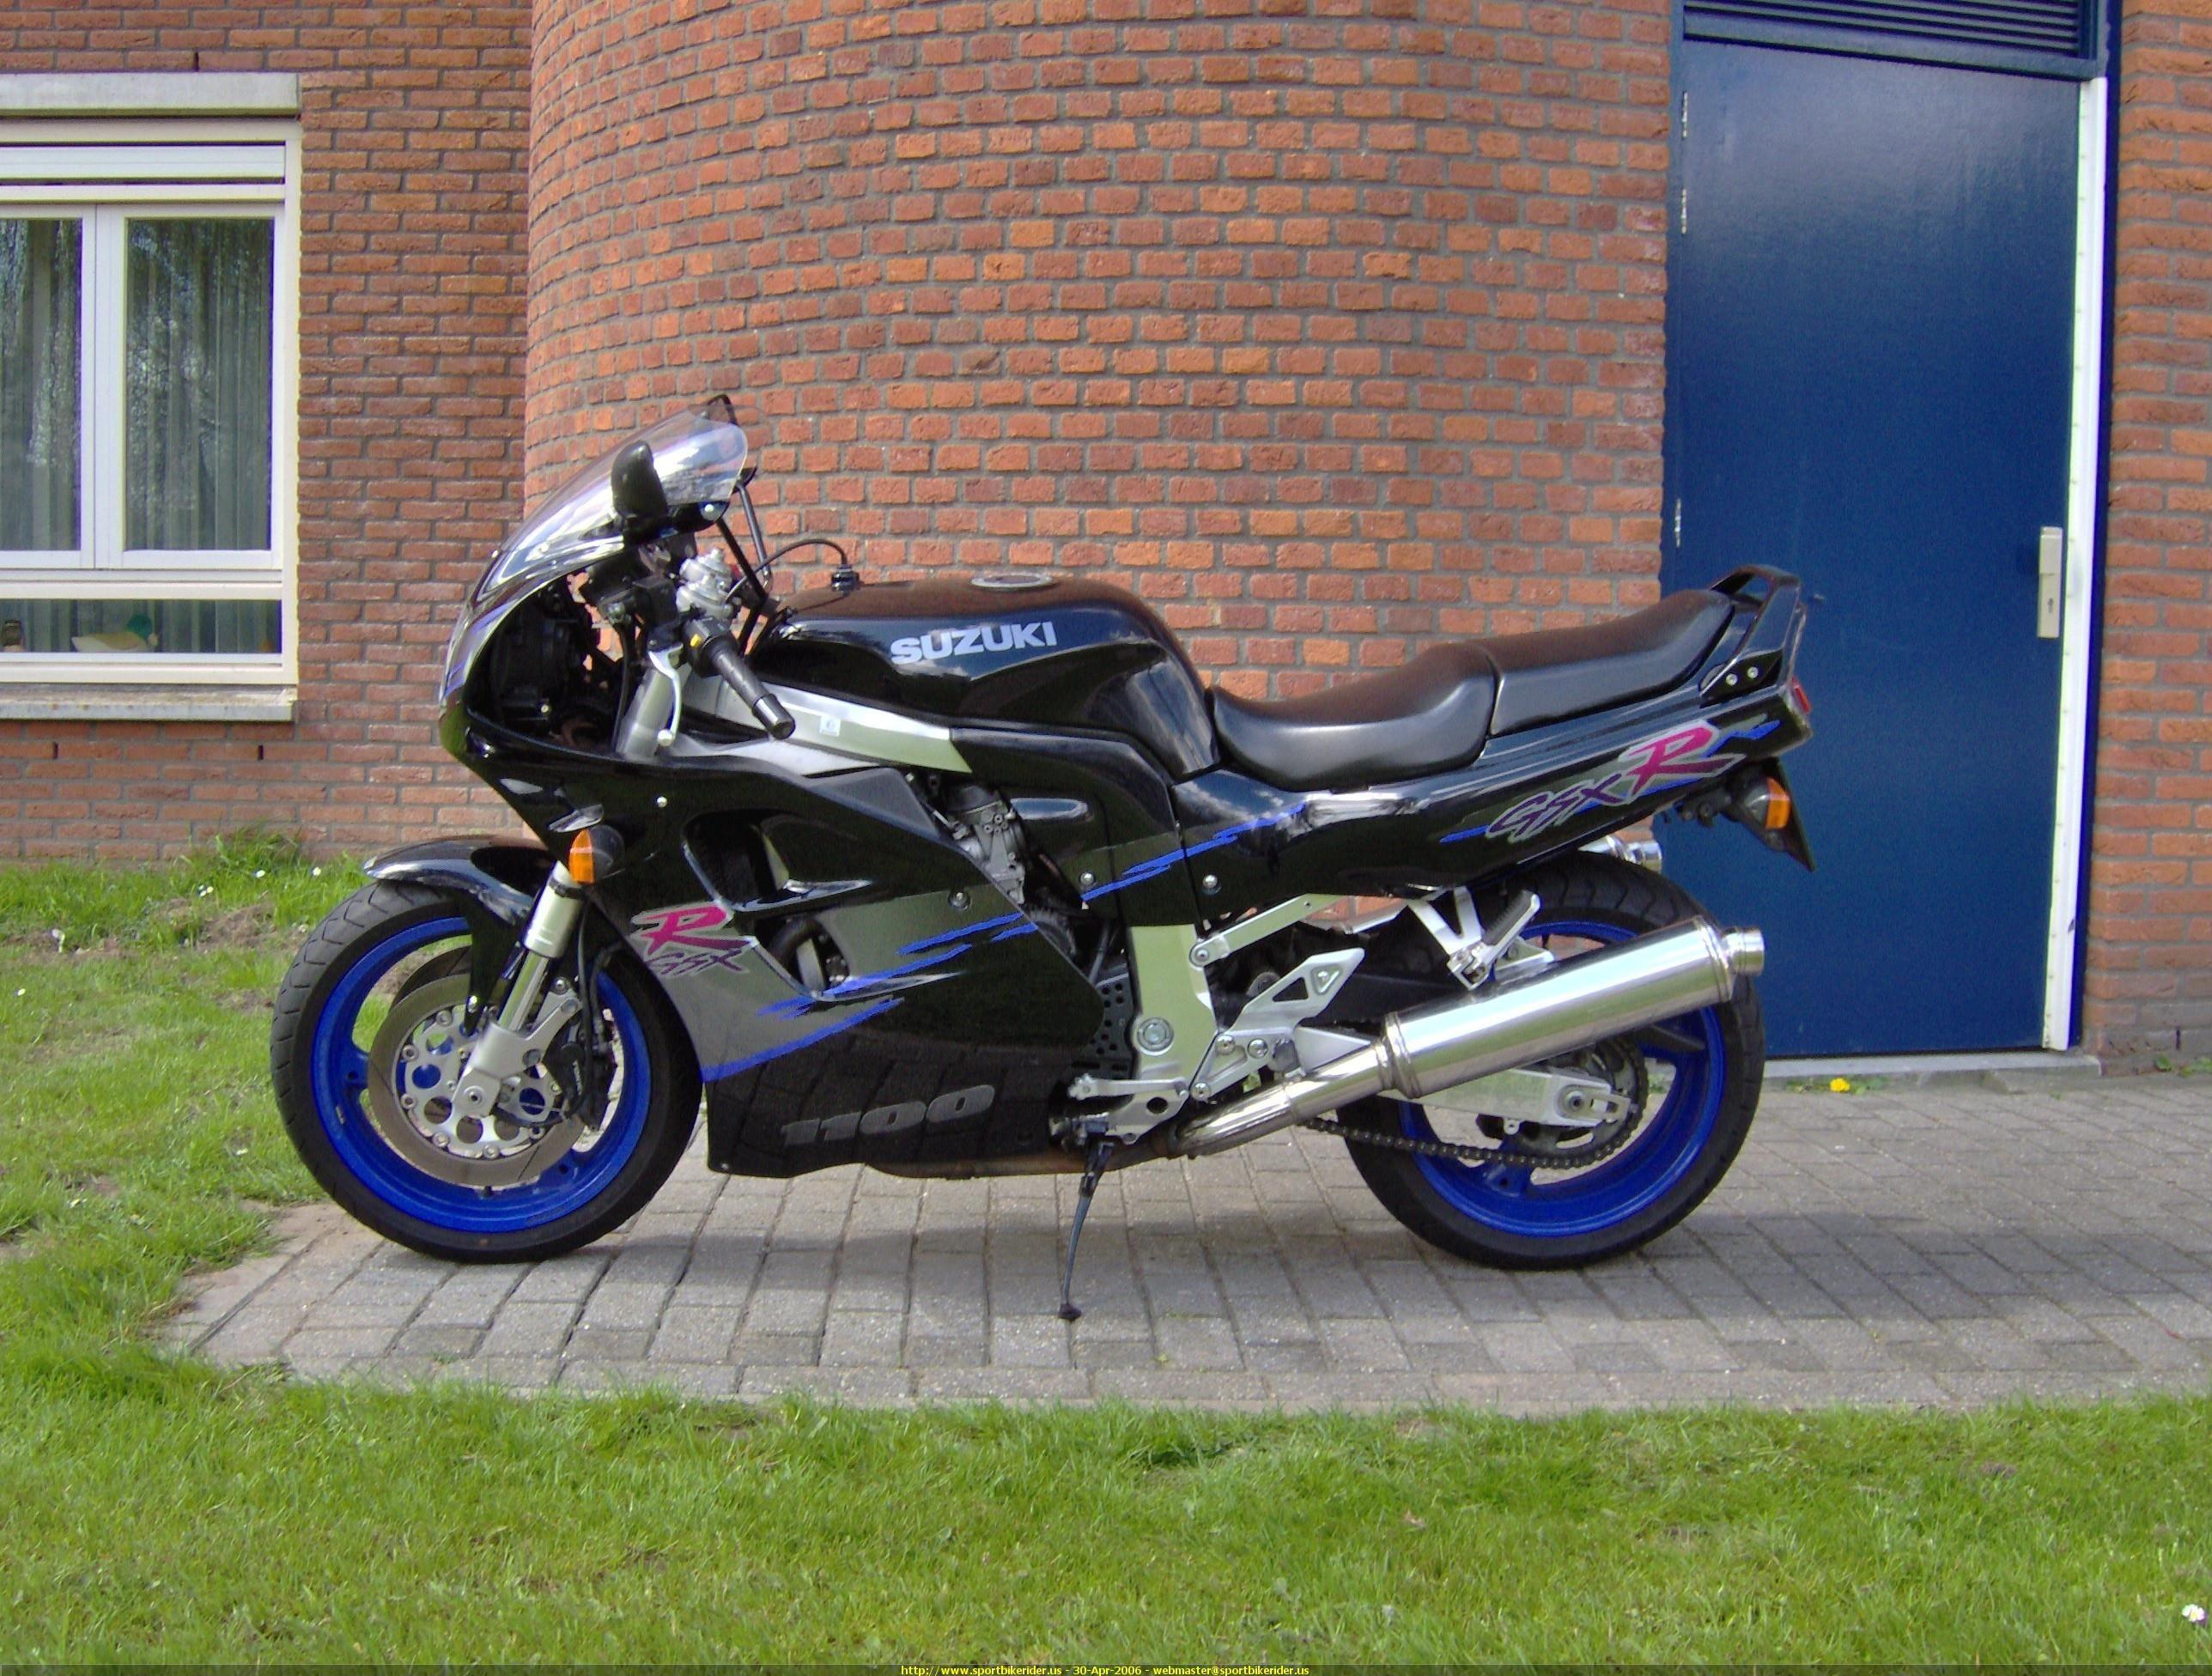 Picture Of A 2005 Ducati 999 Sportbike Id 108972 Sport Bikes Suzuki Gsxr Gsxr 1100